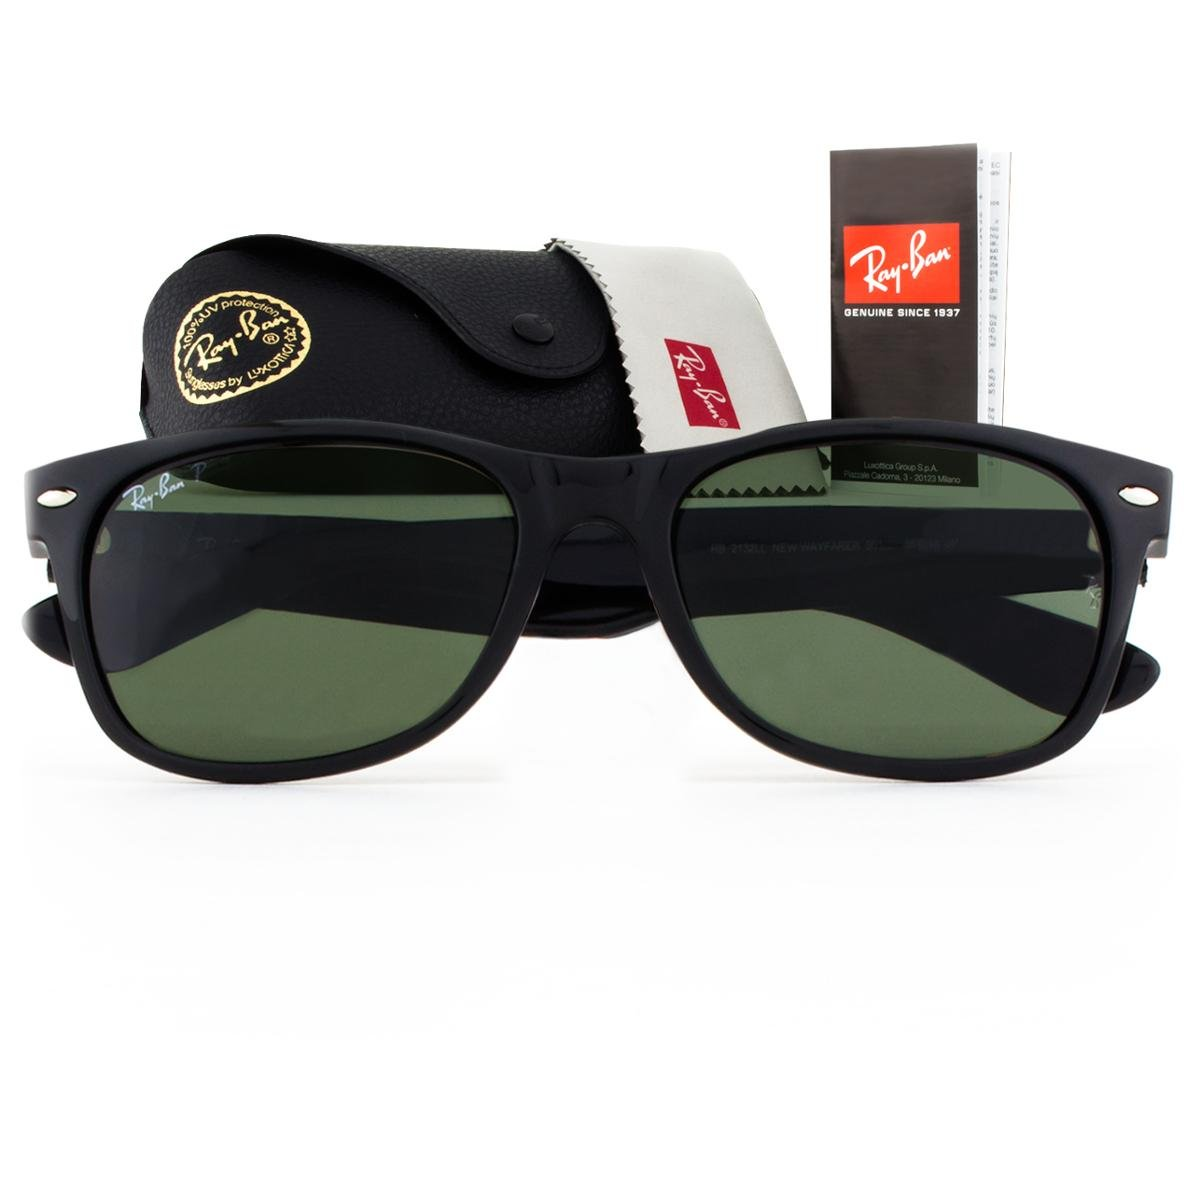 ... Óculos de Sol Ray Ban New Wayfarer Classic Polarizado RB2132LL 901 58-55  Masculino ... 1305756ea3